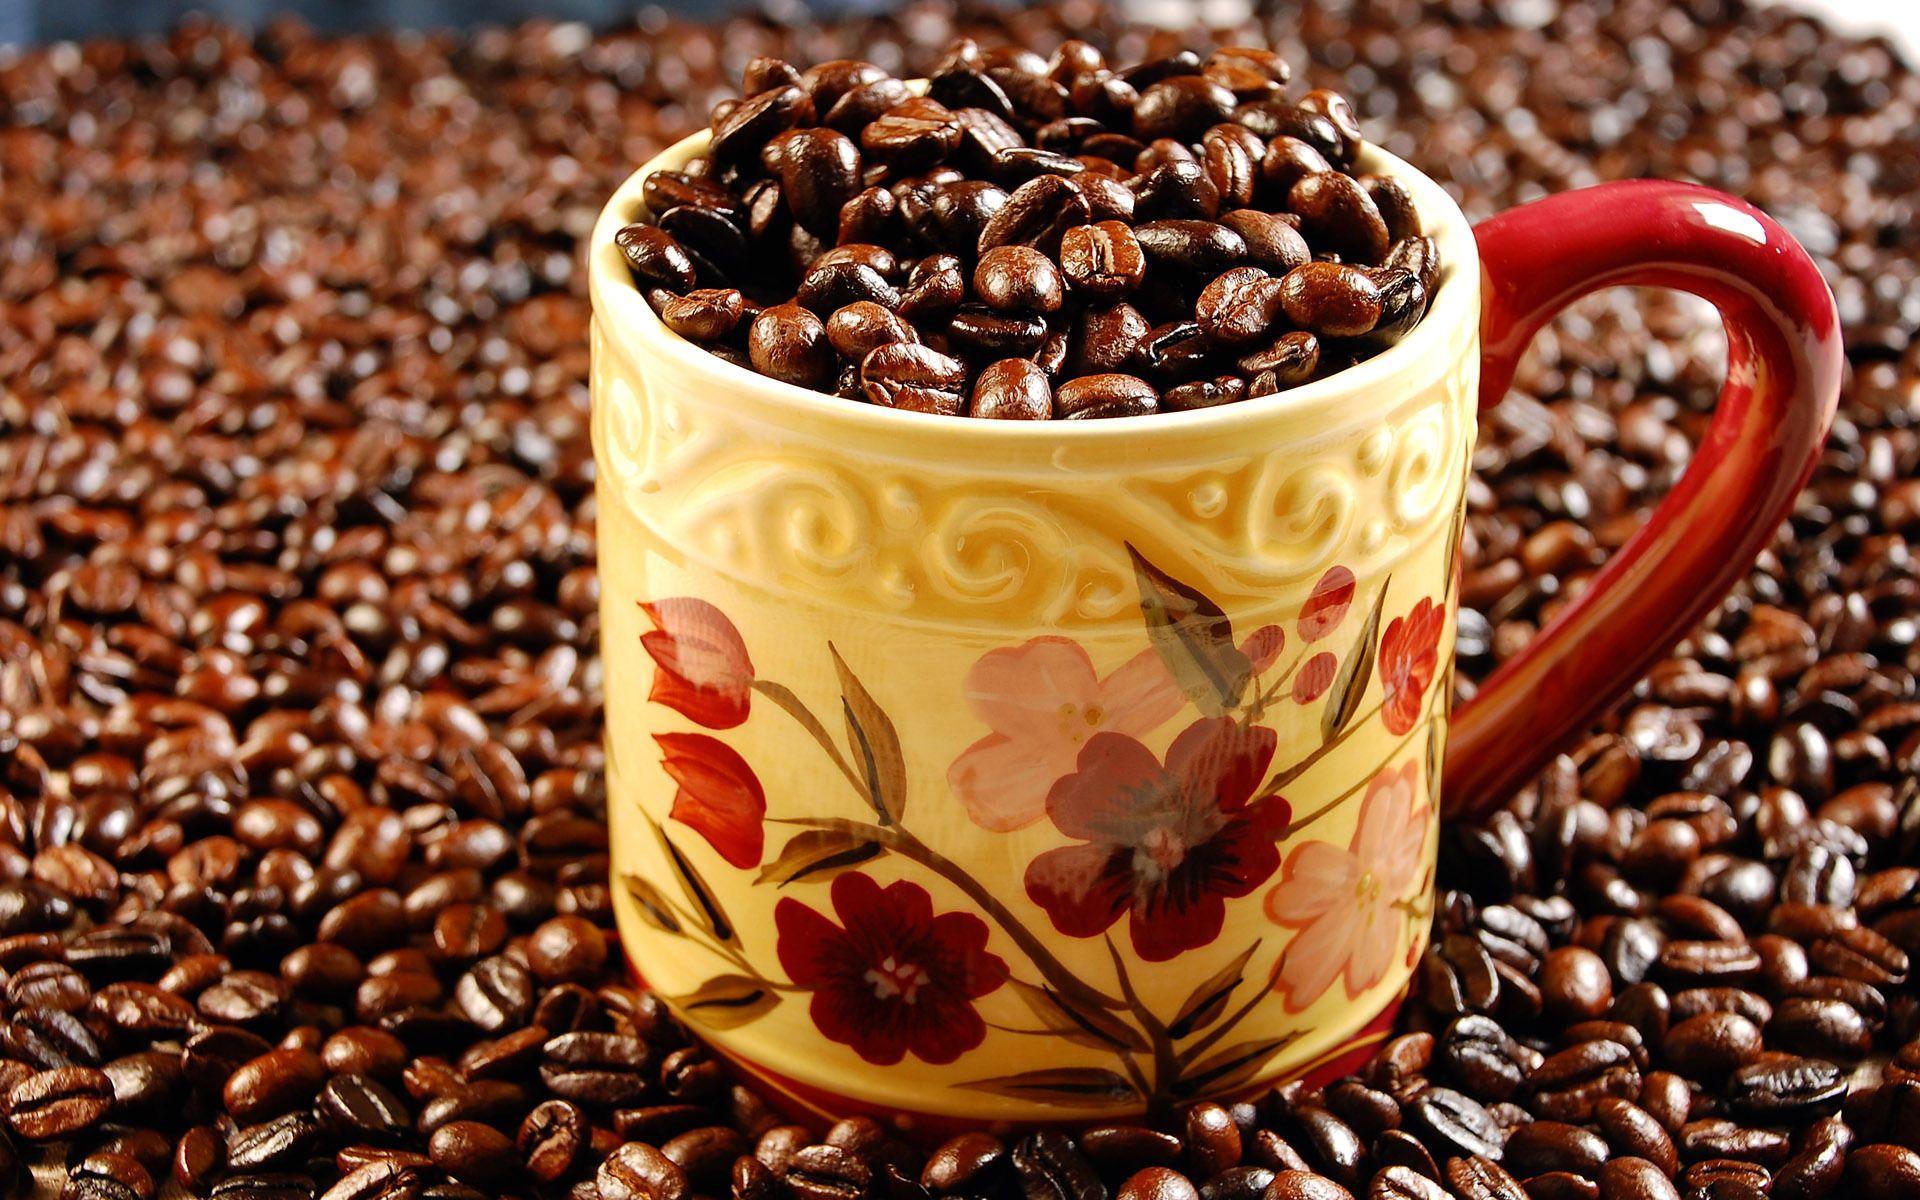 Coffee Wallpaper Coffee Coffee Wallpaper Coffee Decor Free Coffee Wallpaper coffee beans coffee ice hand